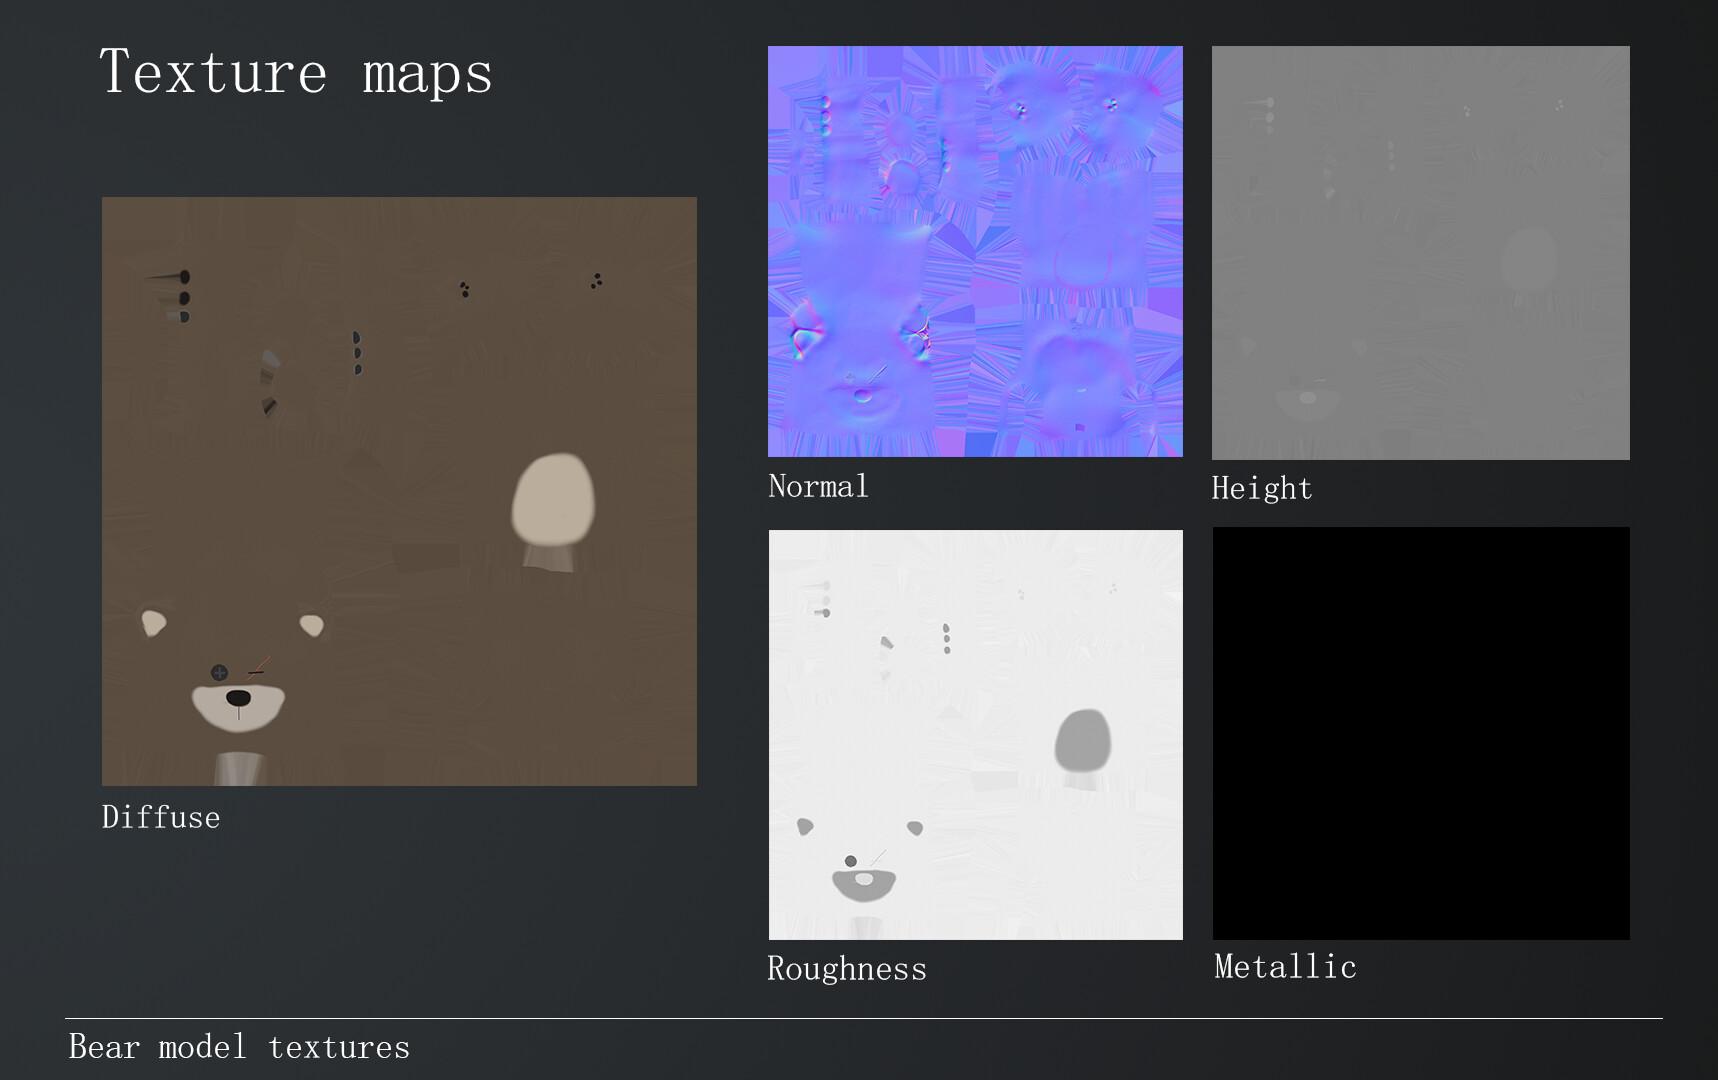 Bear texture maps